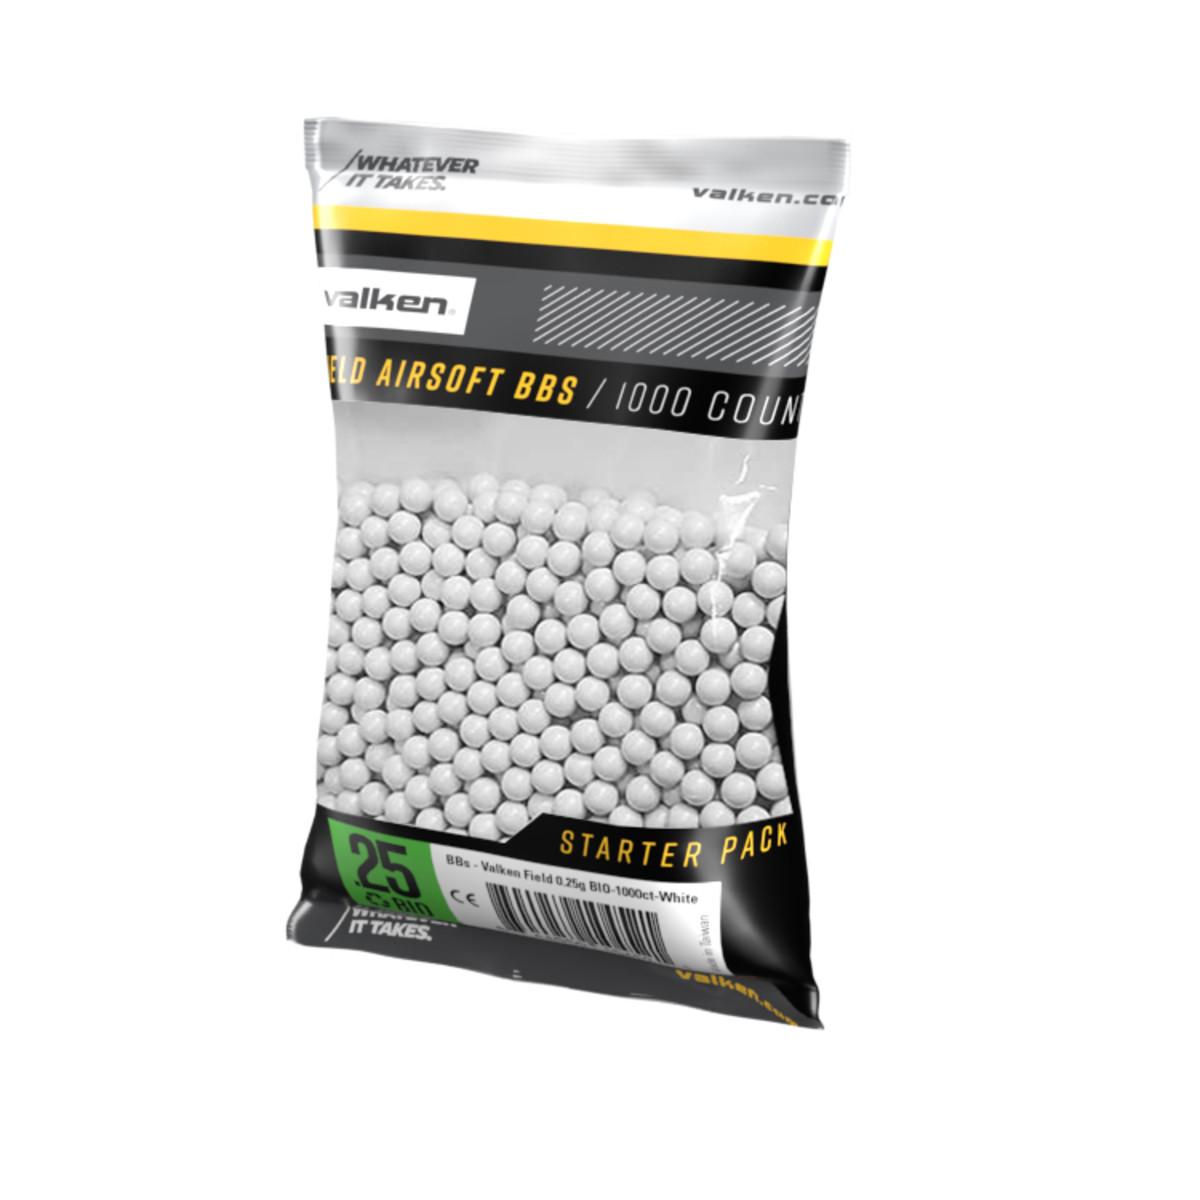 BBs – Valken Field 0.25g BIO-1000ct-White product image